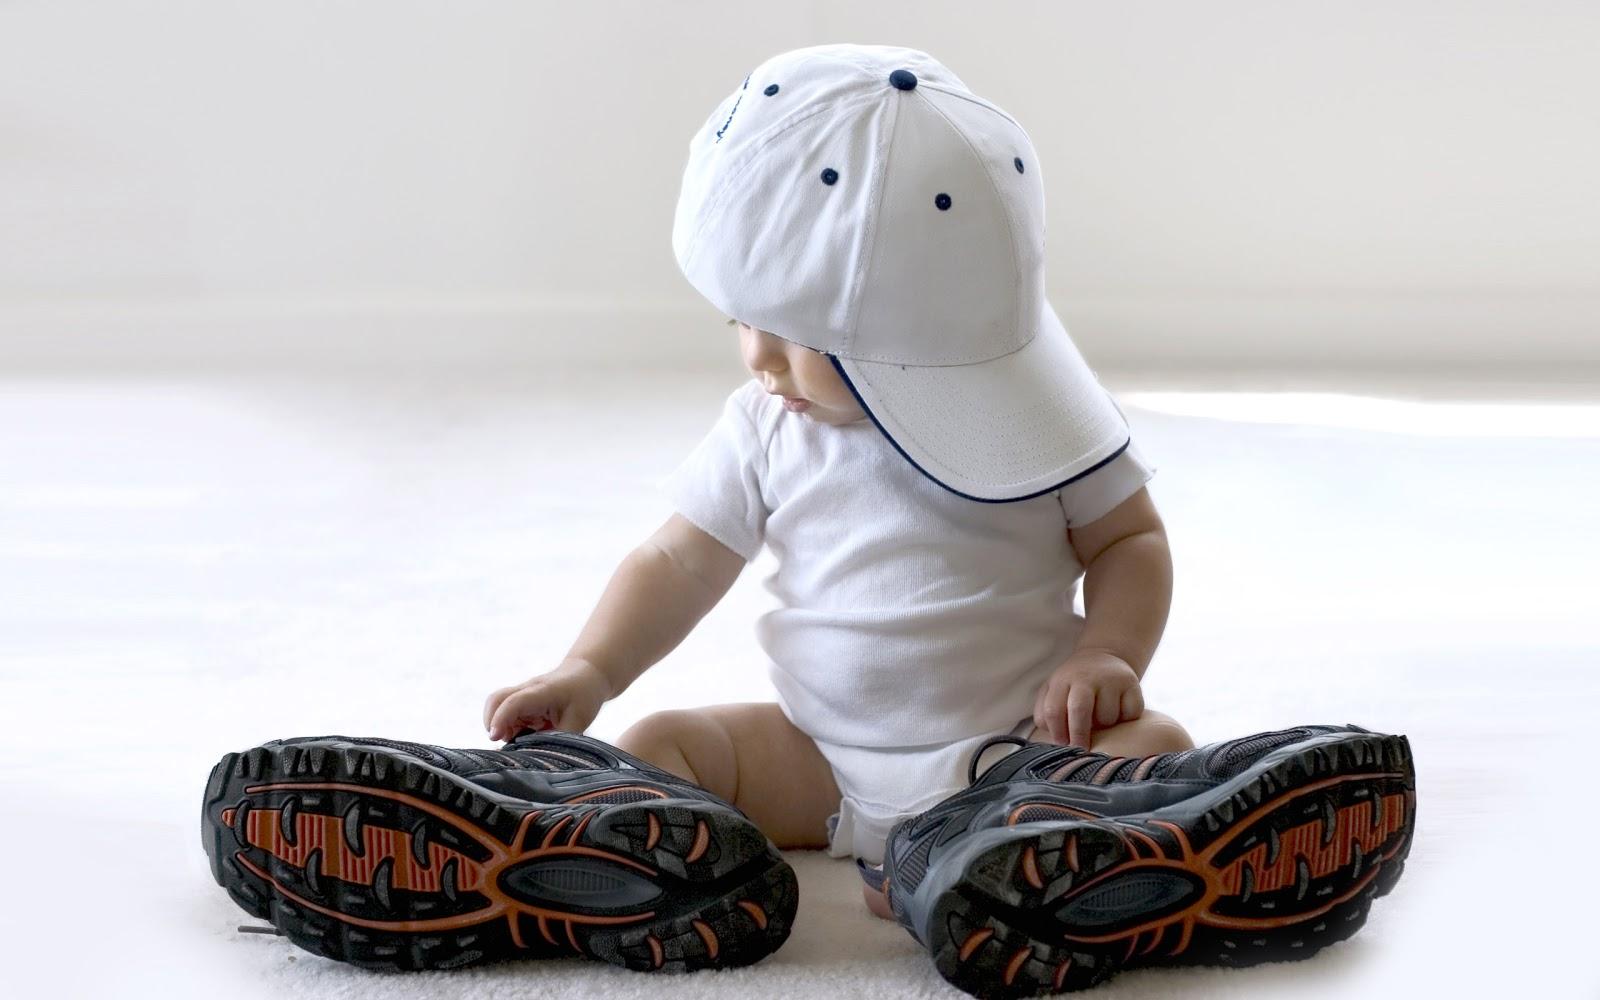 Gambar Bayi Bayi Keren Cool Tapi Lucu Foto Gambar Terbaru